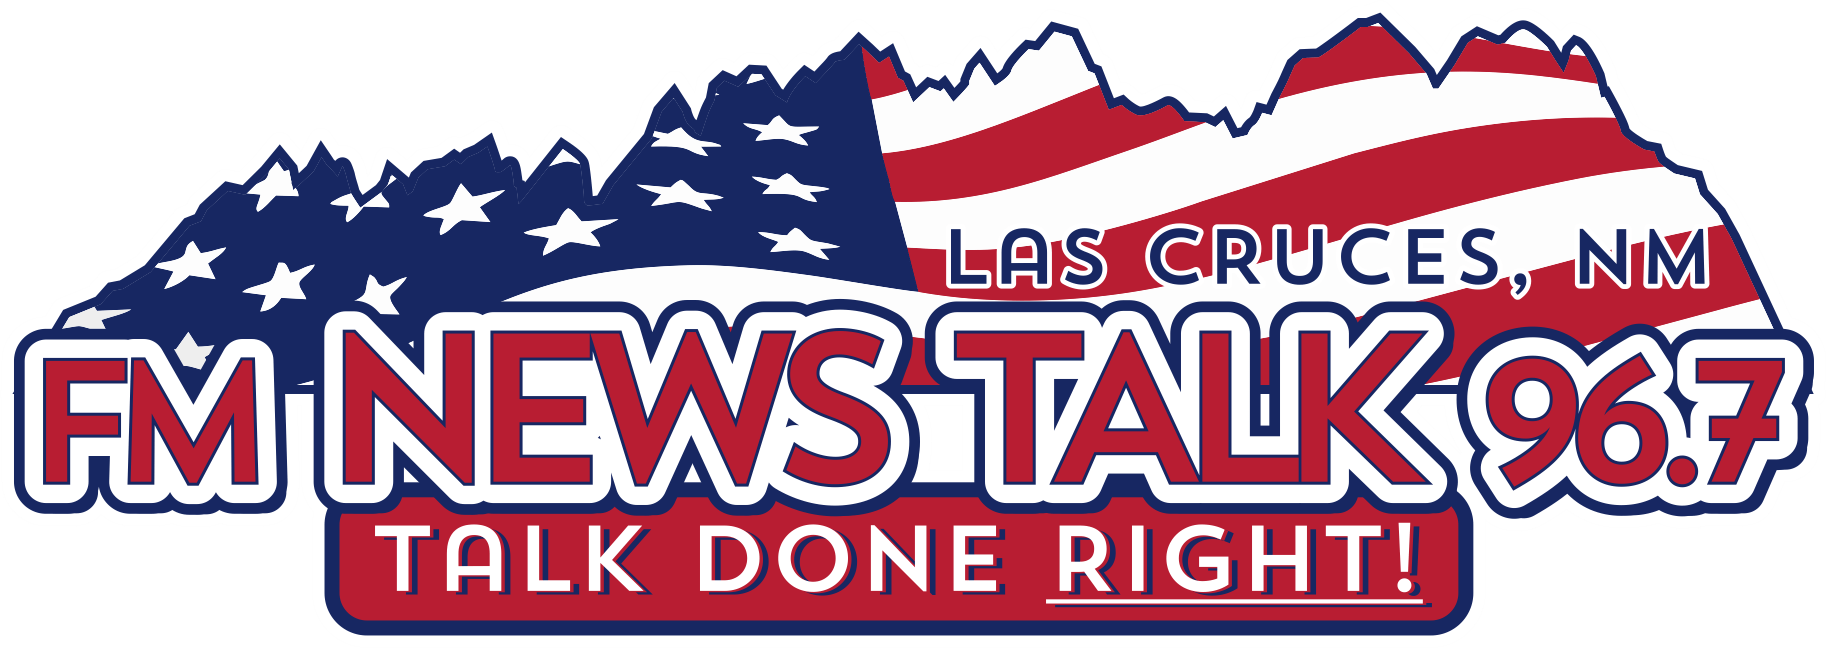 LATEST NEWS - Bravo Mic Communications, LLC